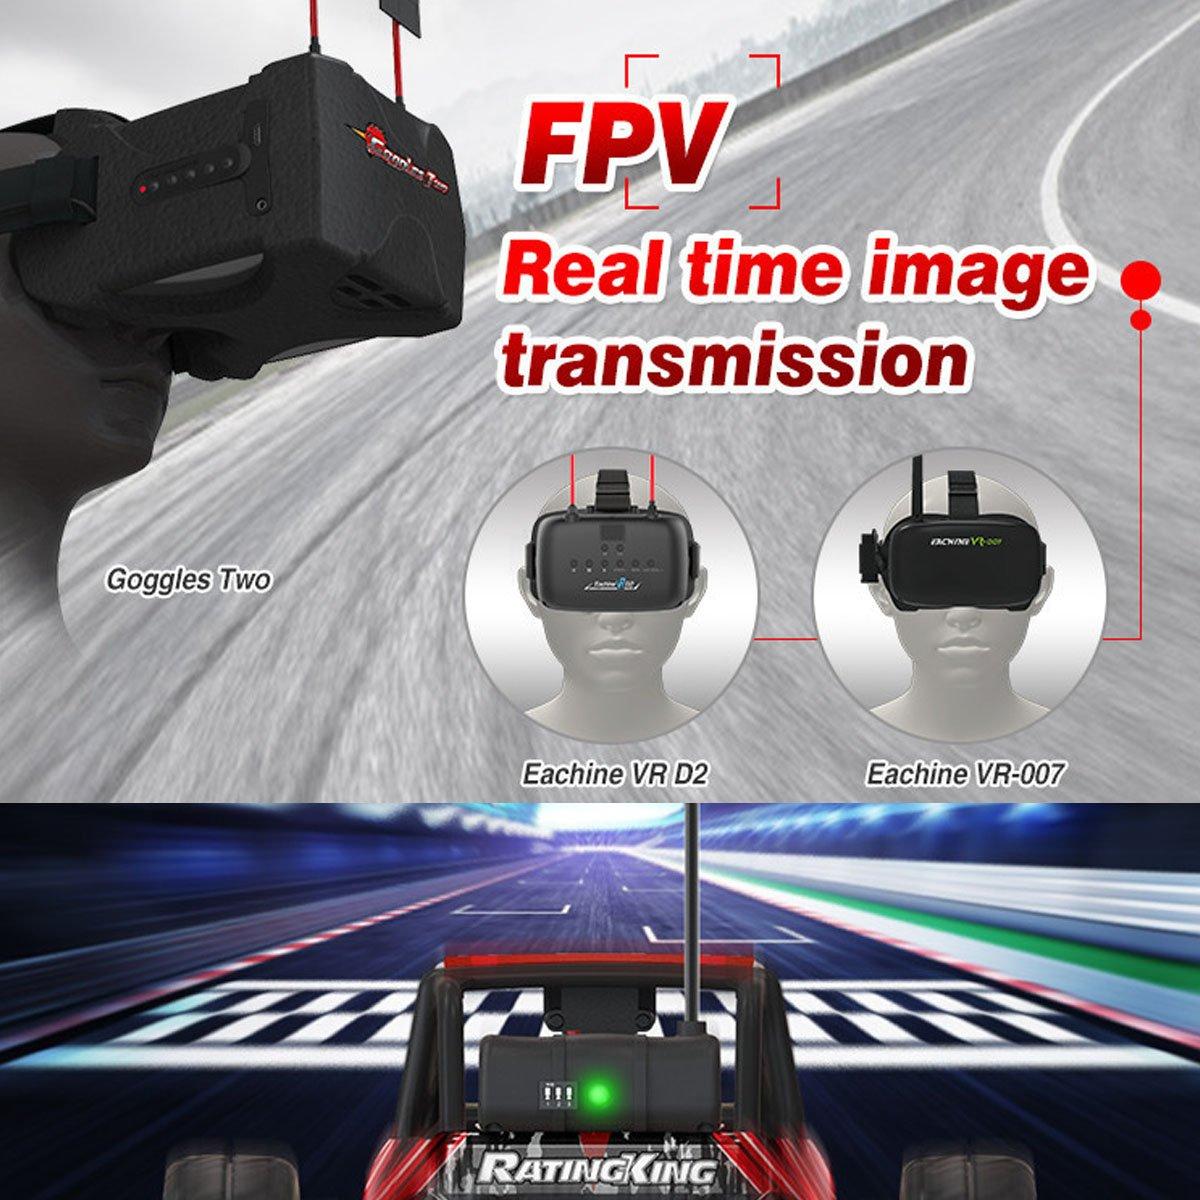 Rc Fpv Racing Car Eachine Ratingking F14 Real Time